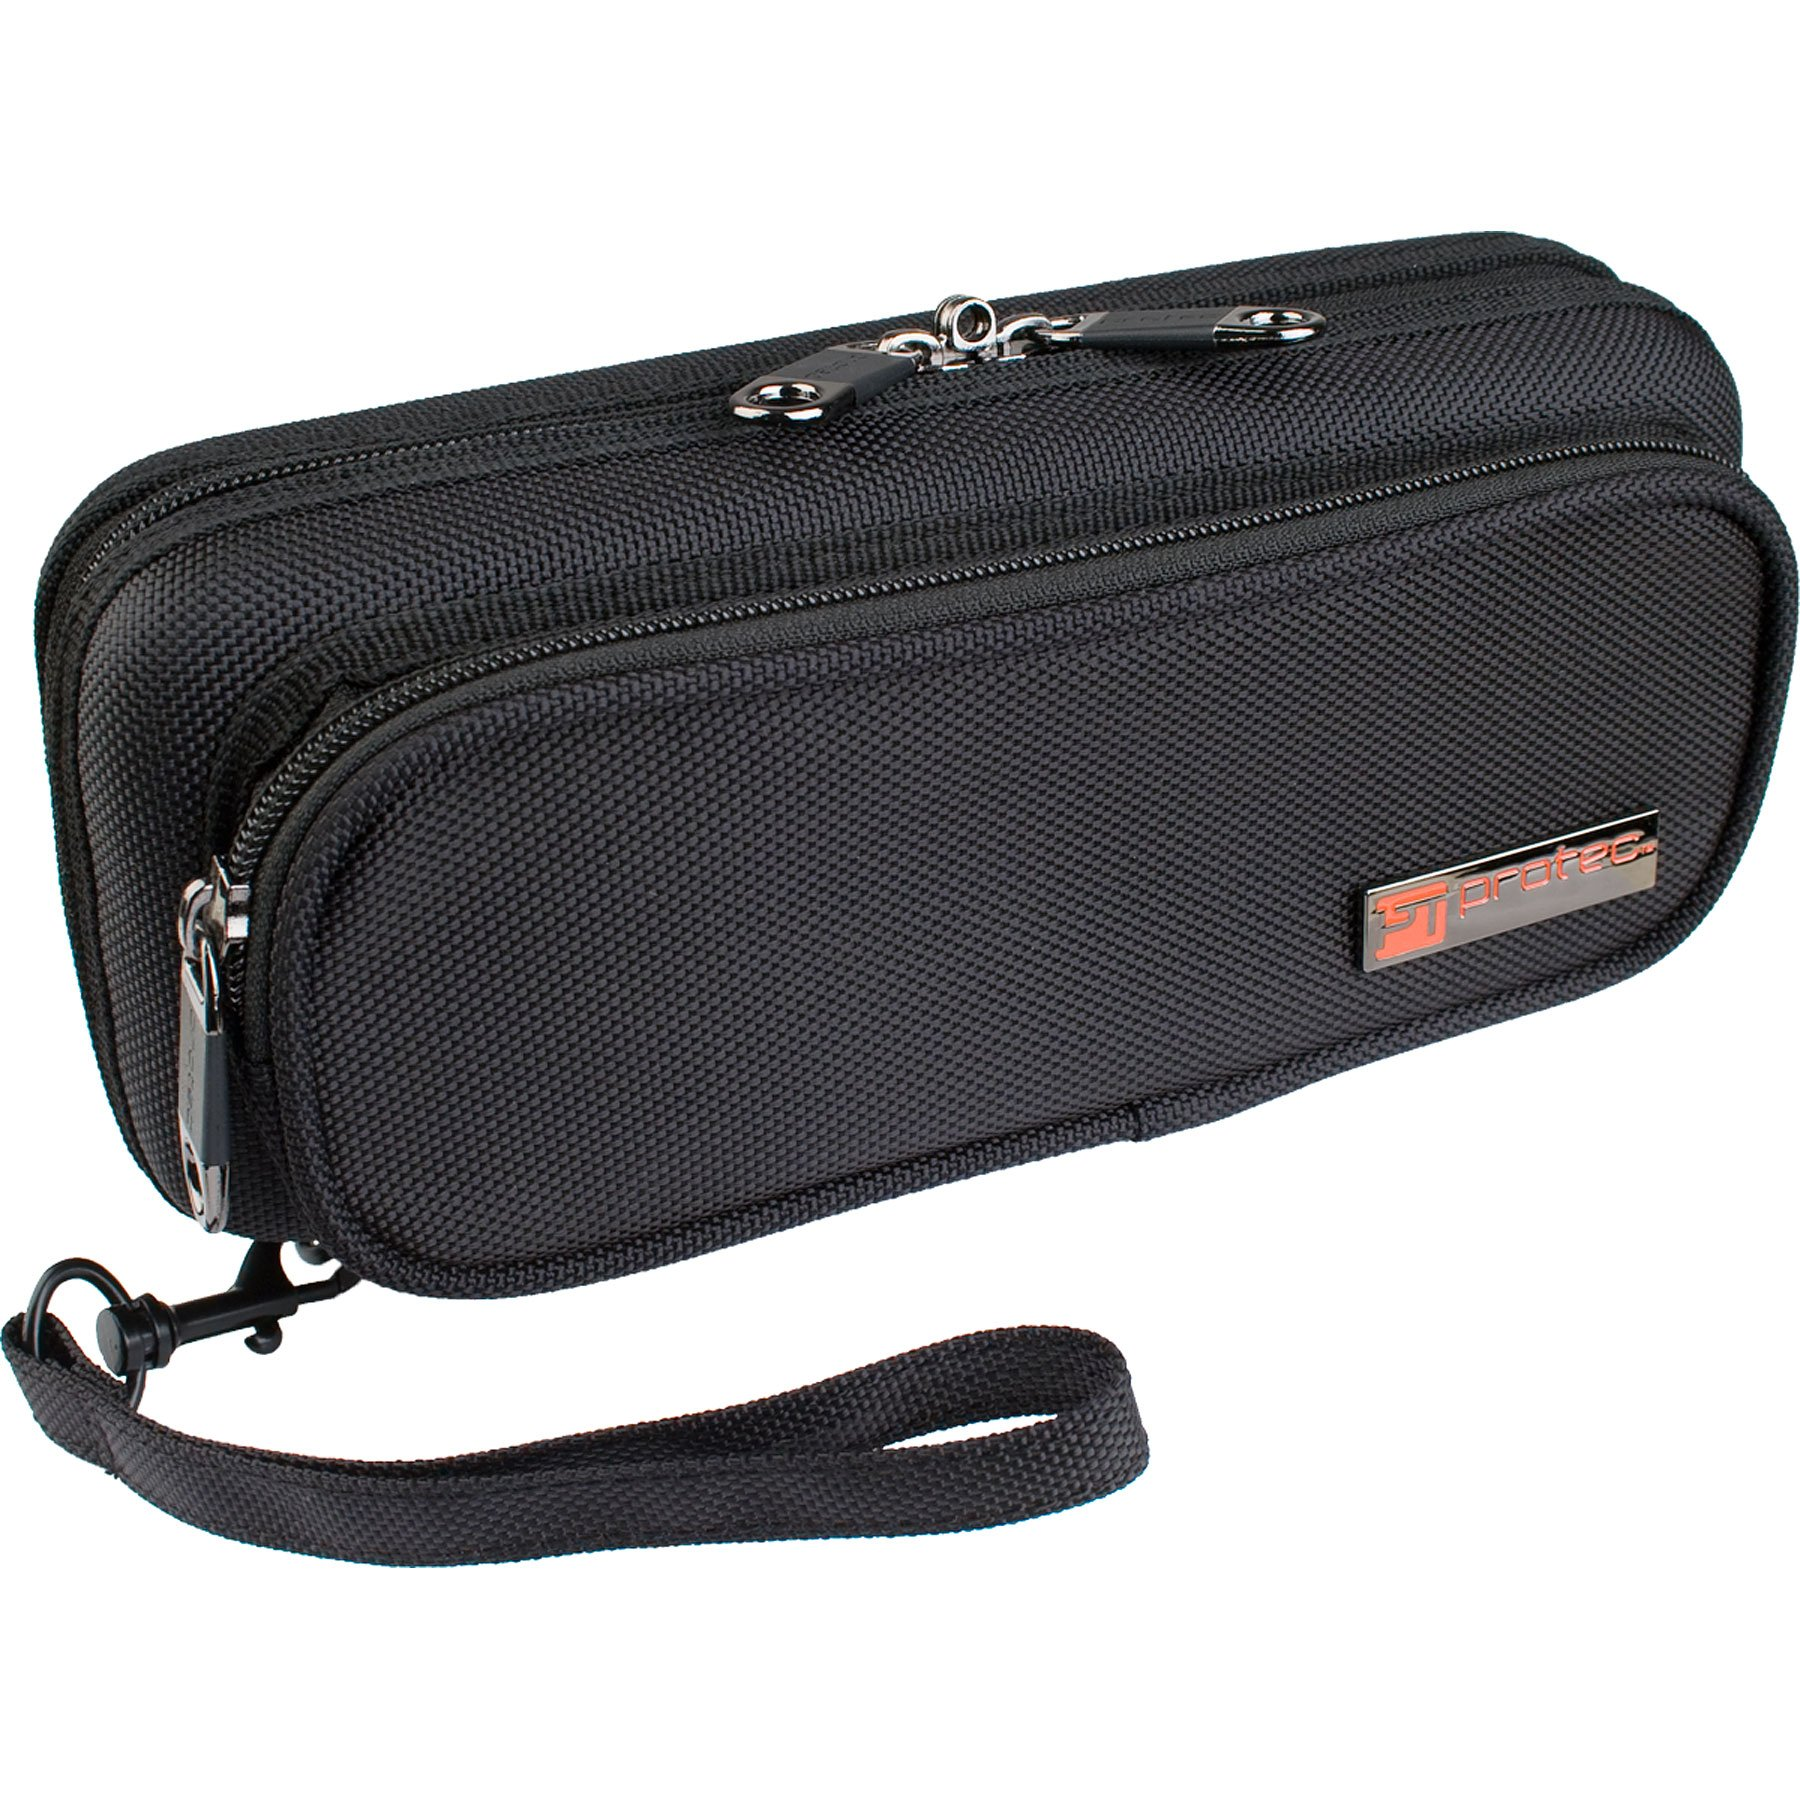 Piccolo PRO PAC Case by Protec, Model PB318